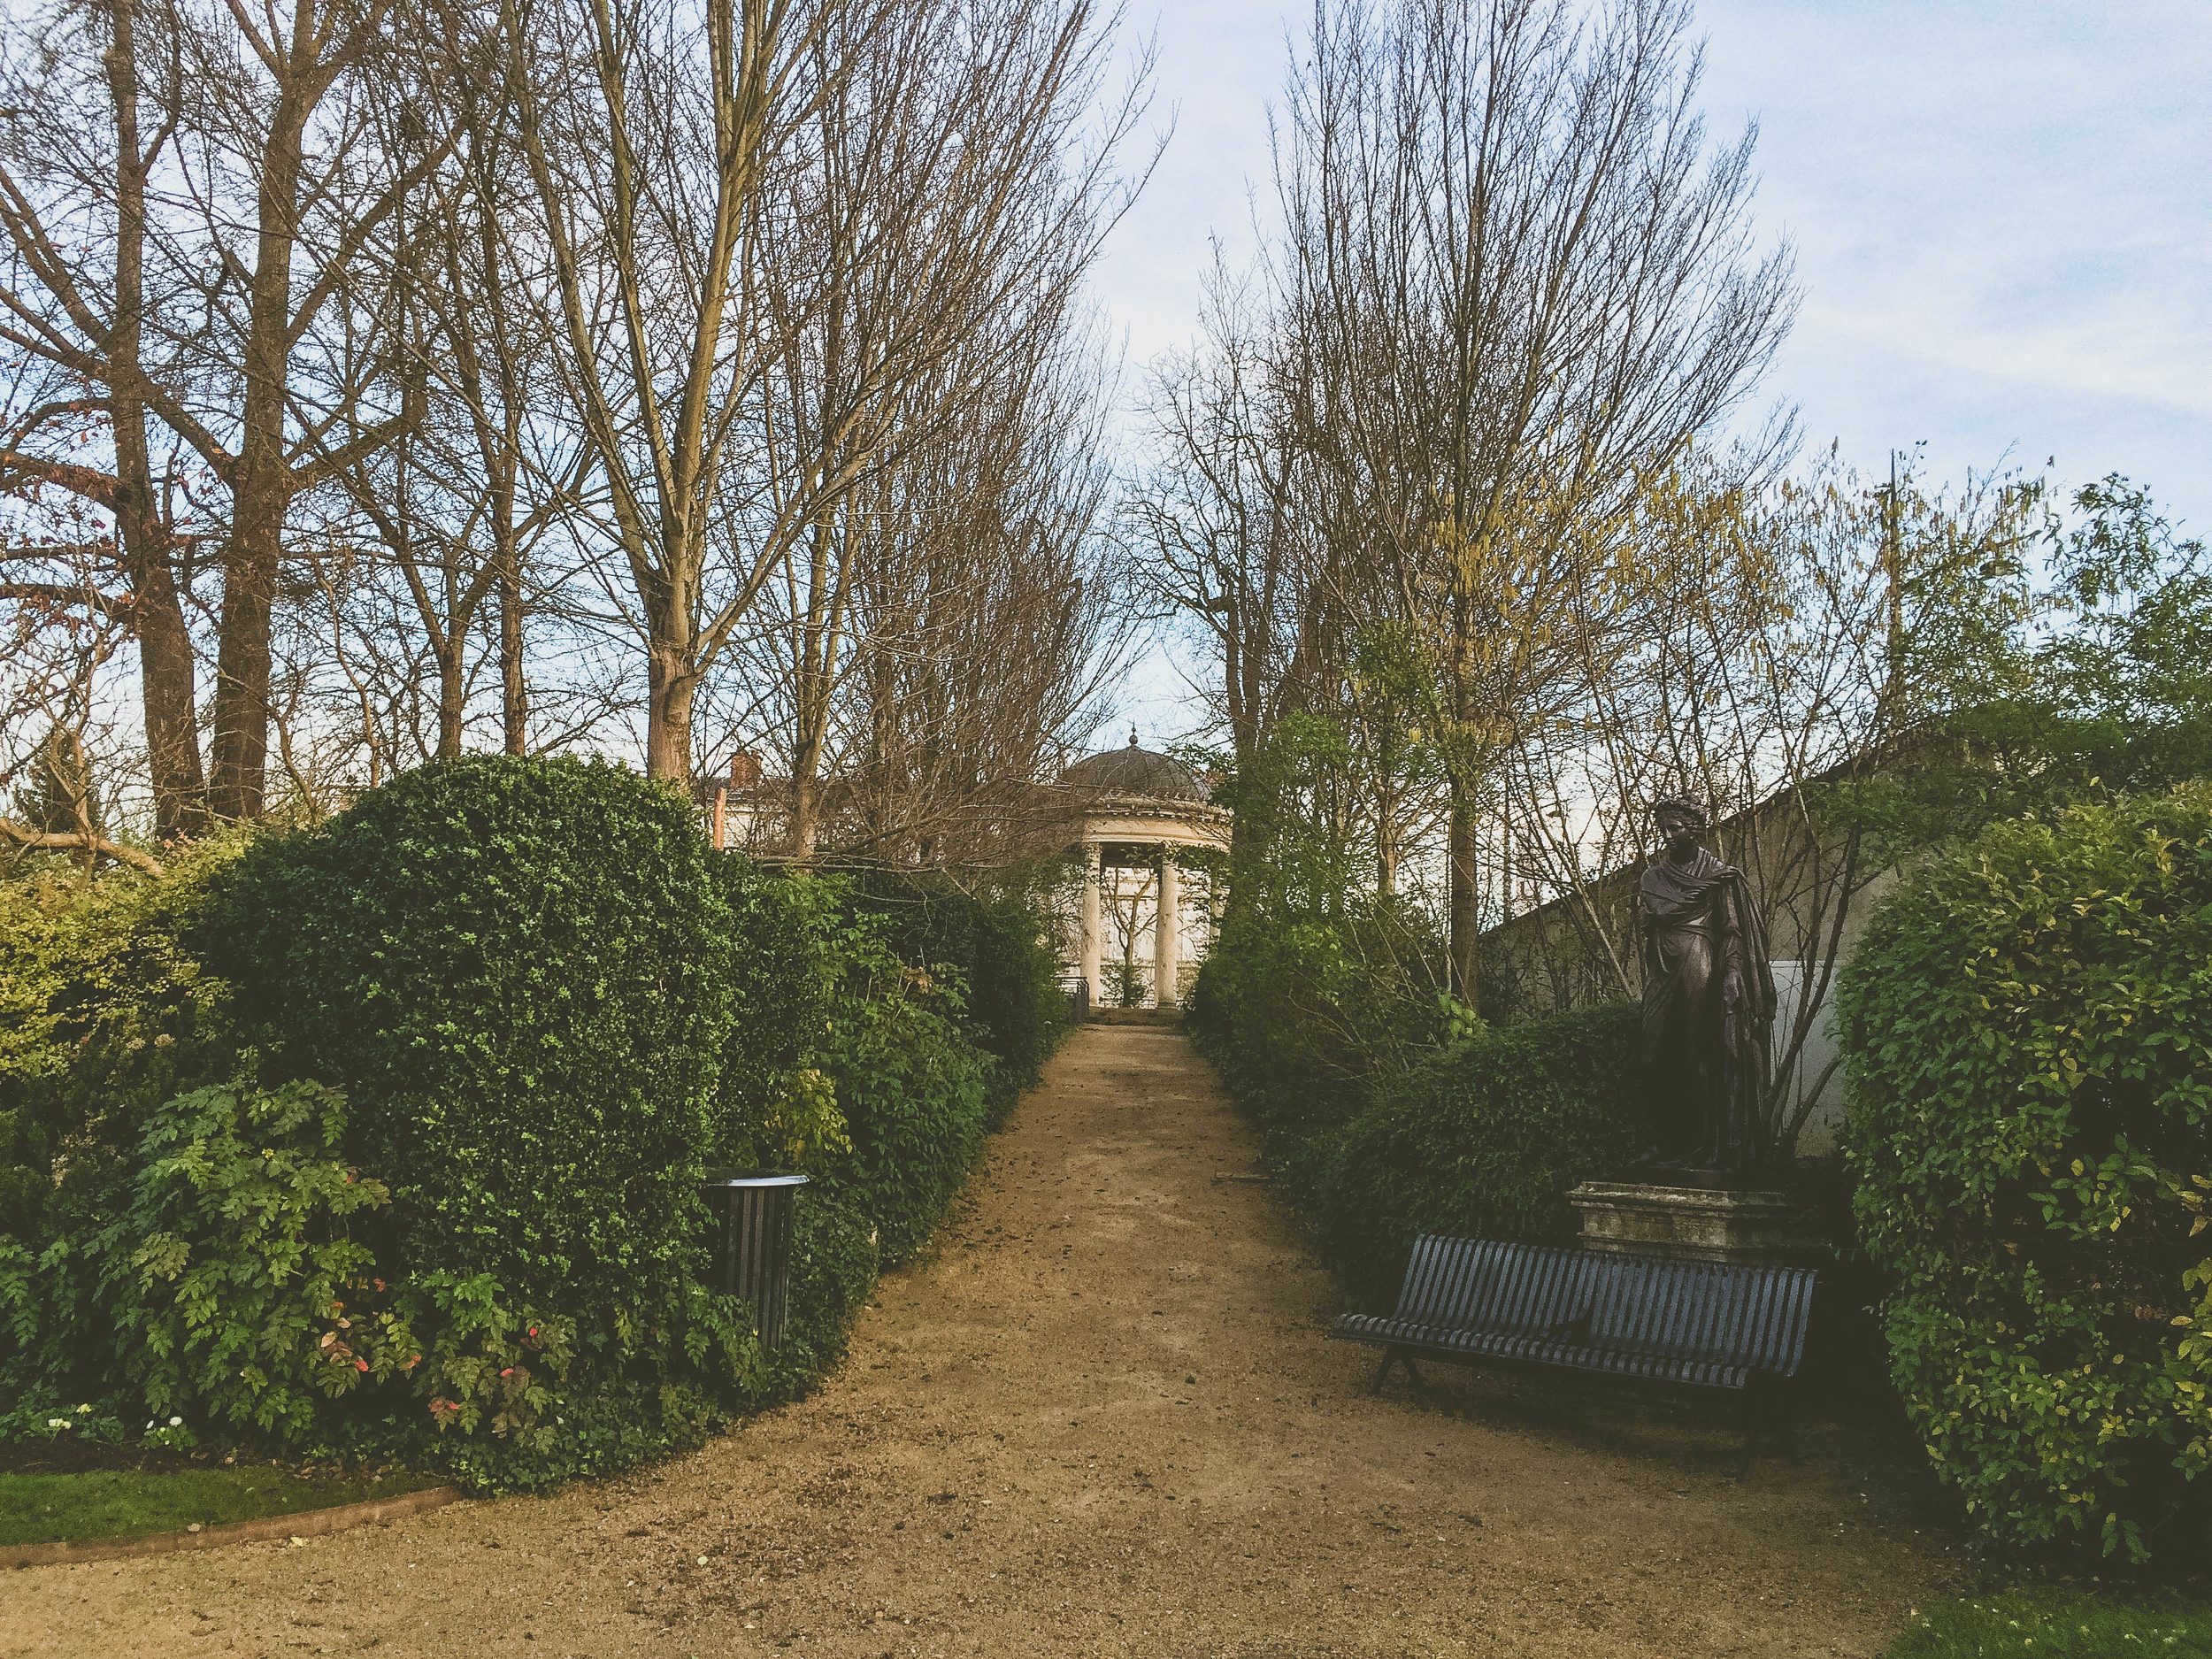 Garden, Épernay, France